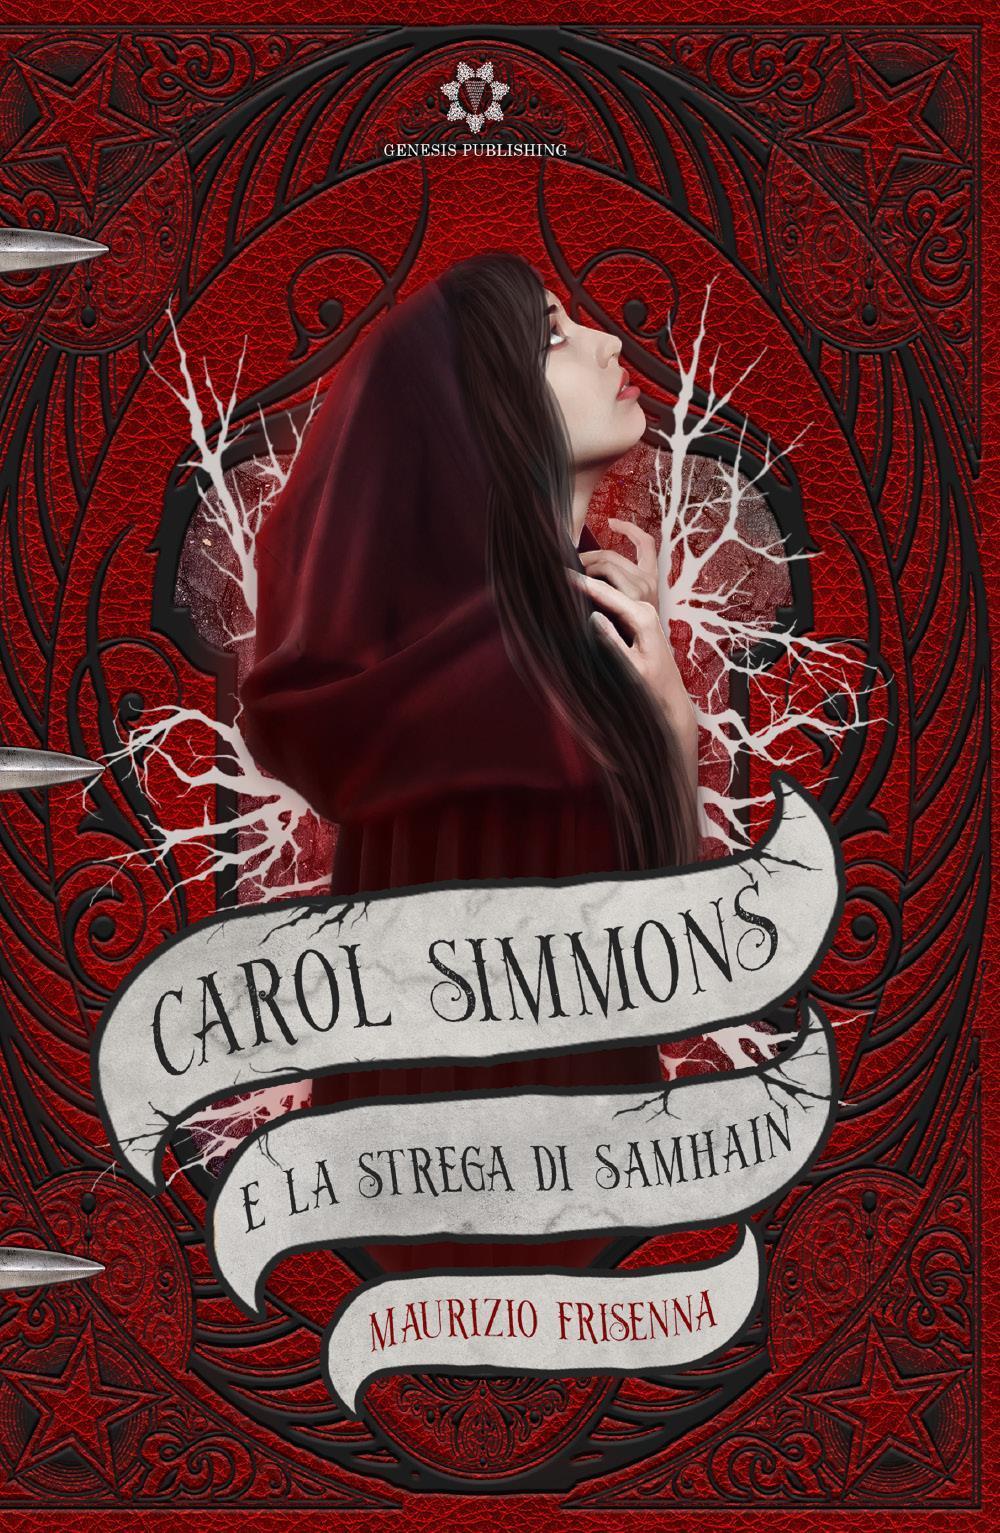 Carol Simmons e la strega di Samhain - VOL. 1